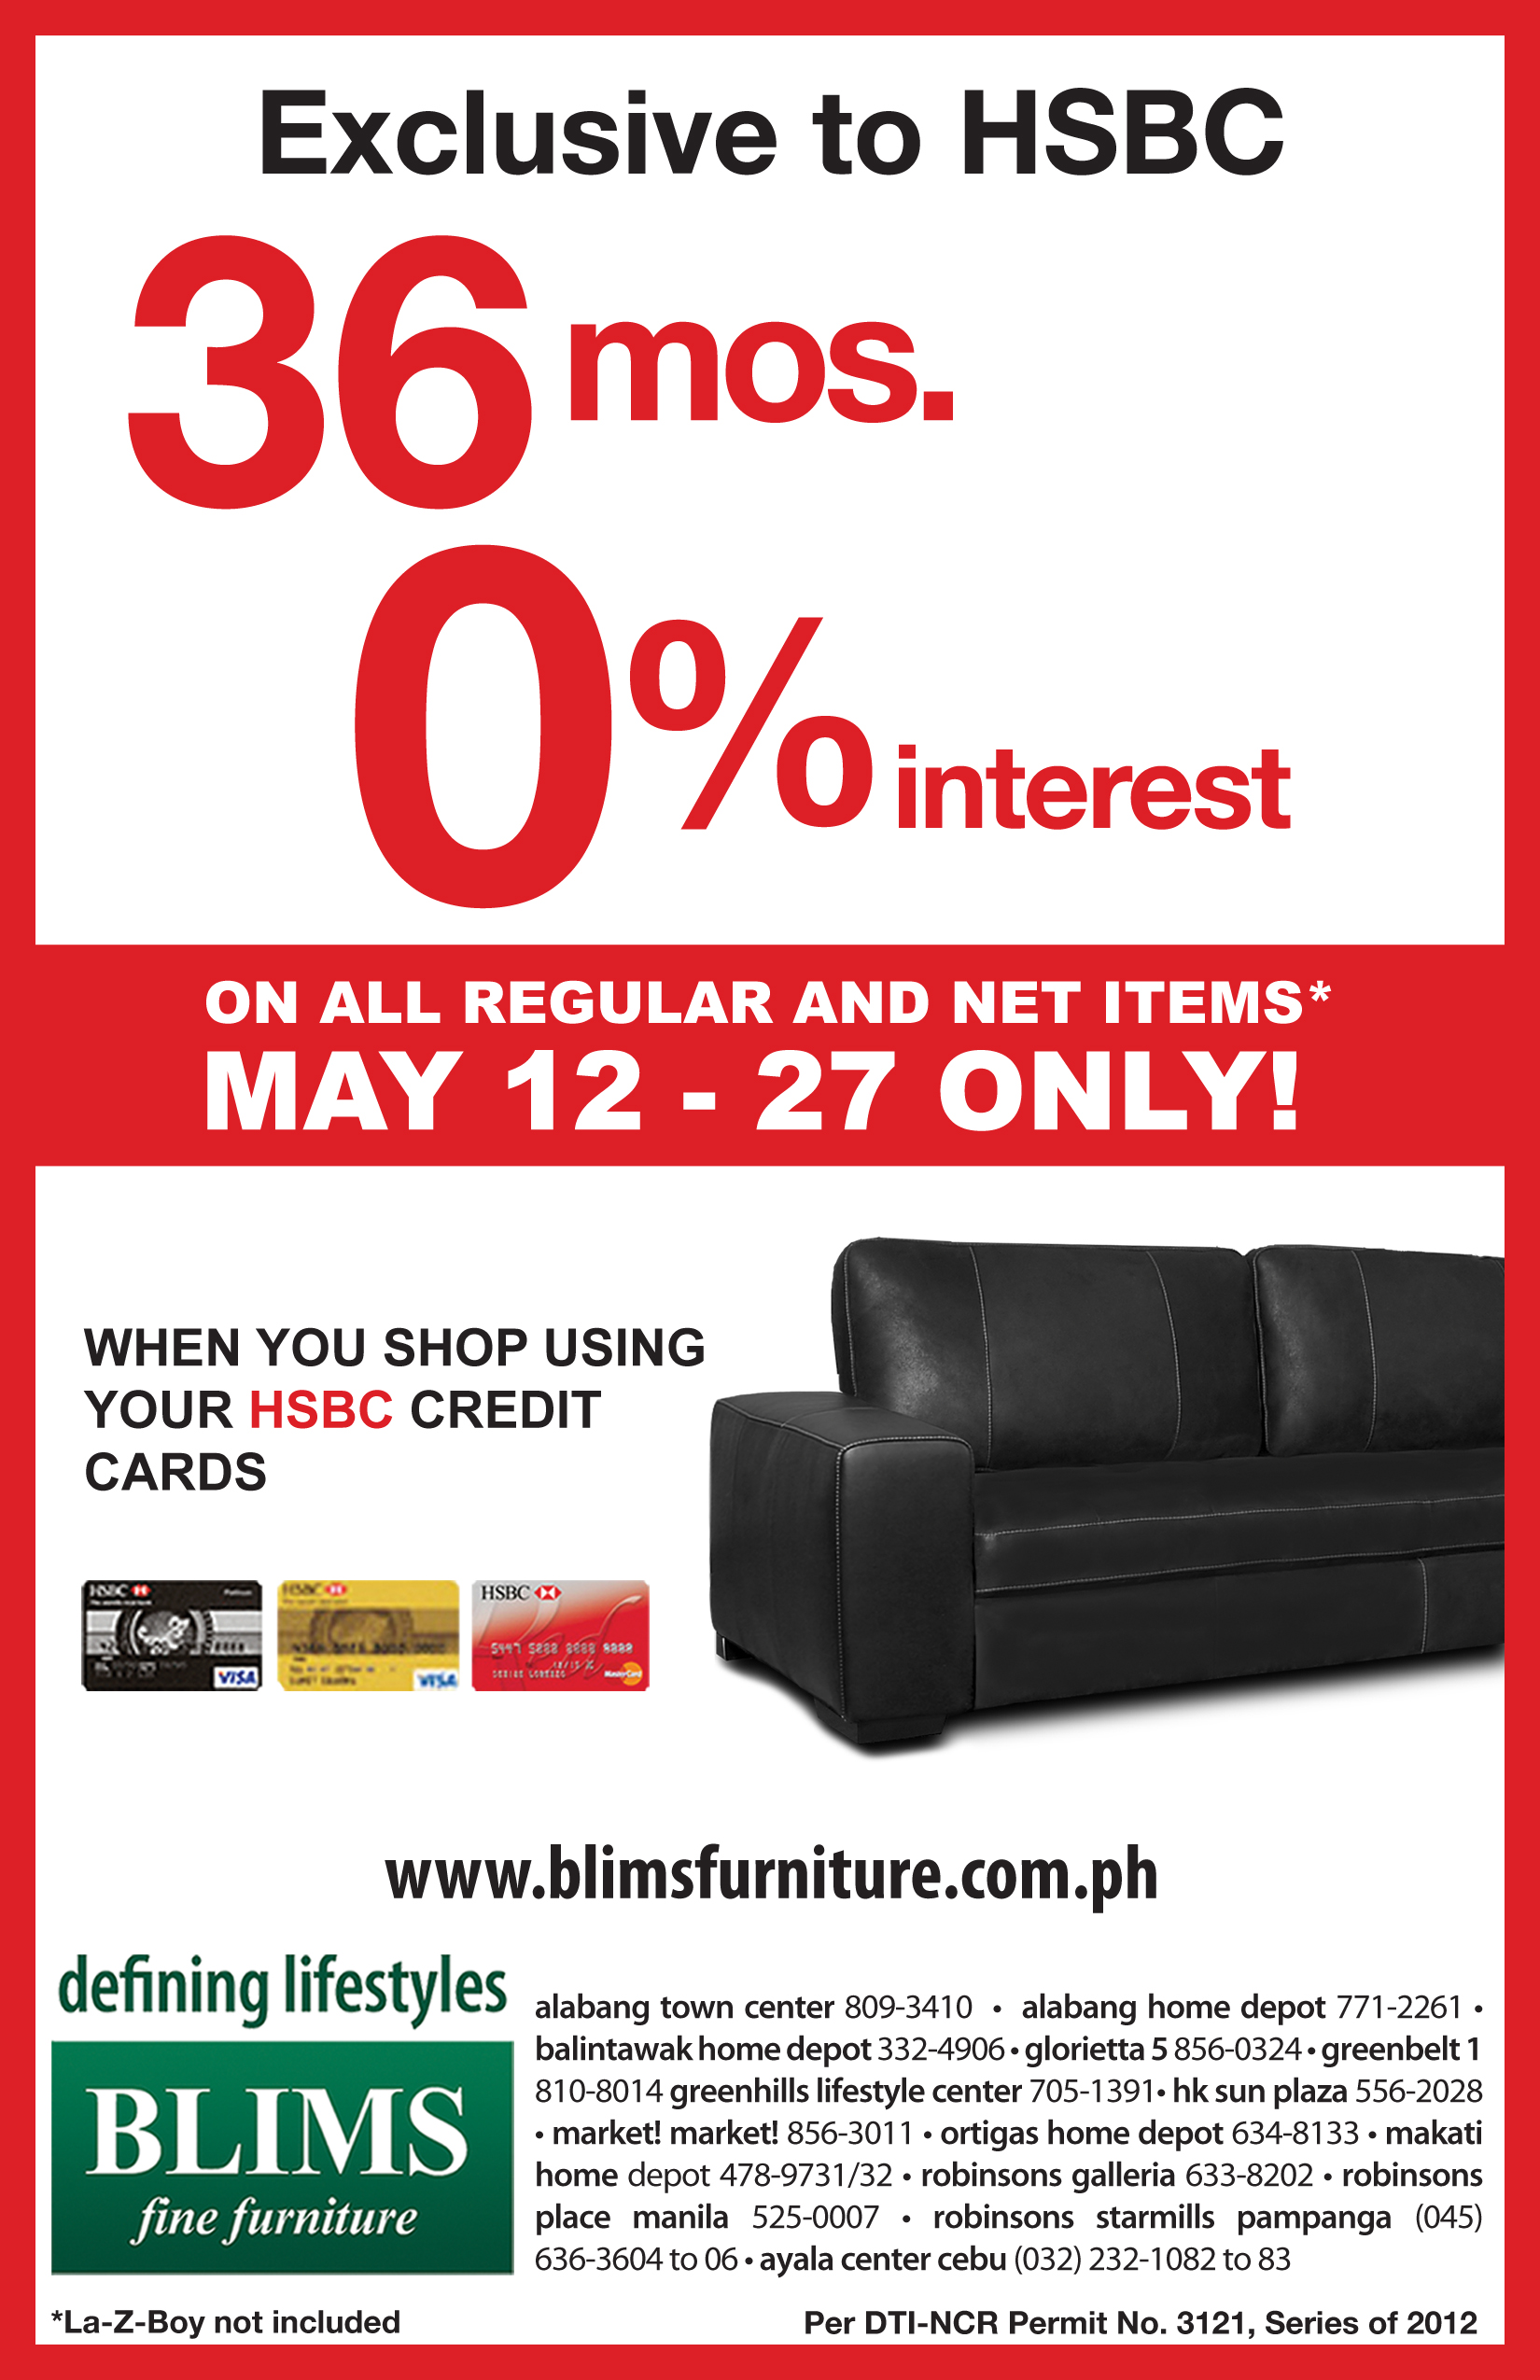 Blims Fine Furniture-HSBC Installment Program Promo May 2012